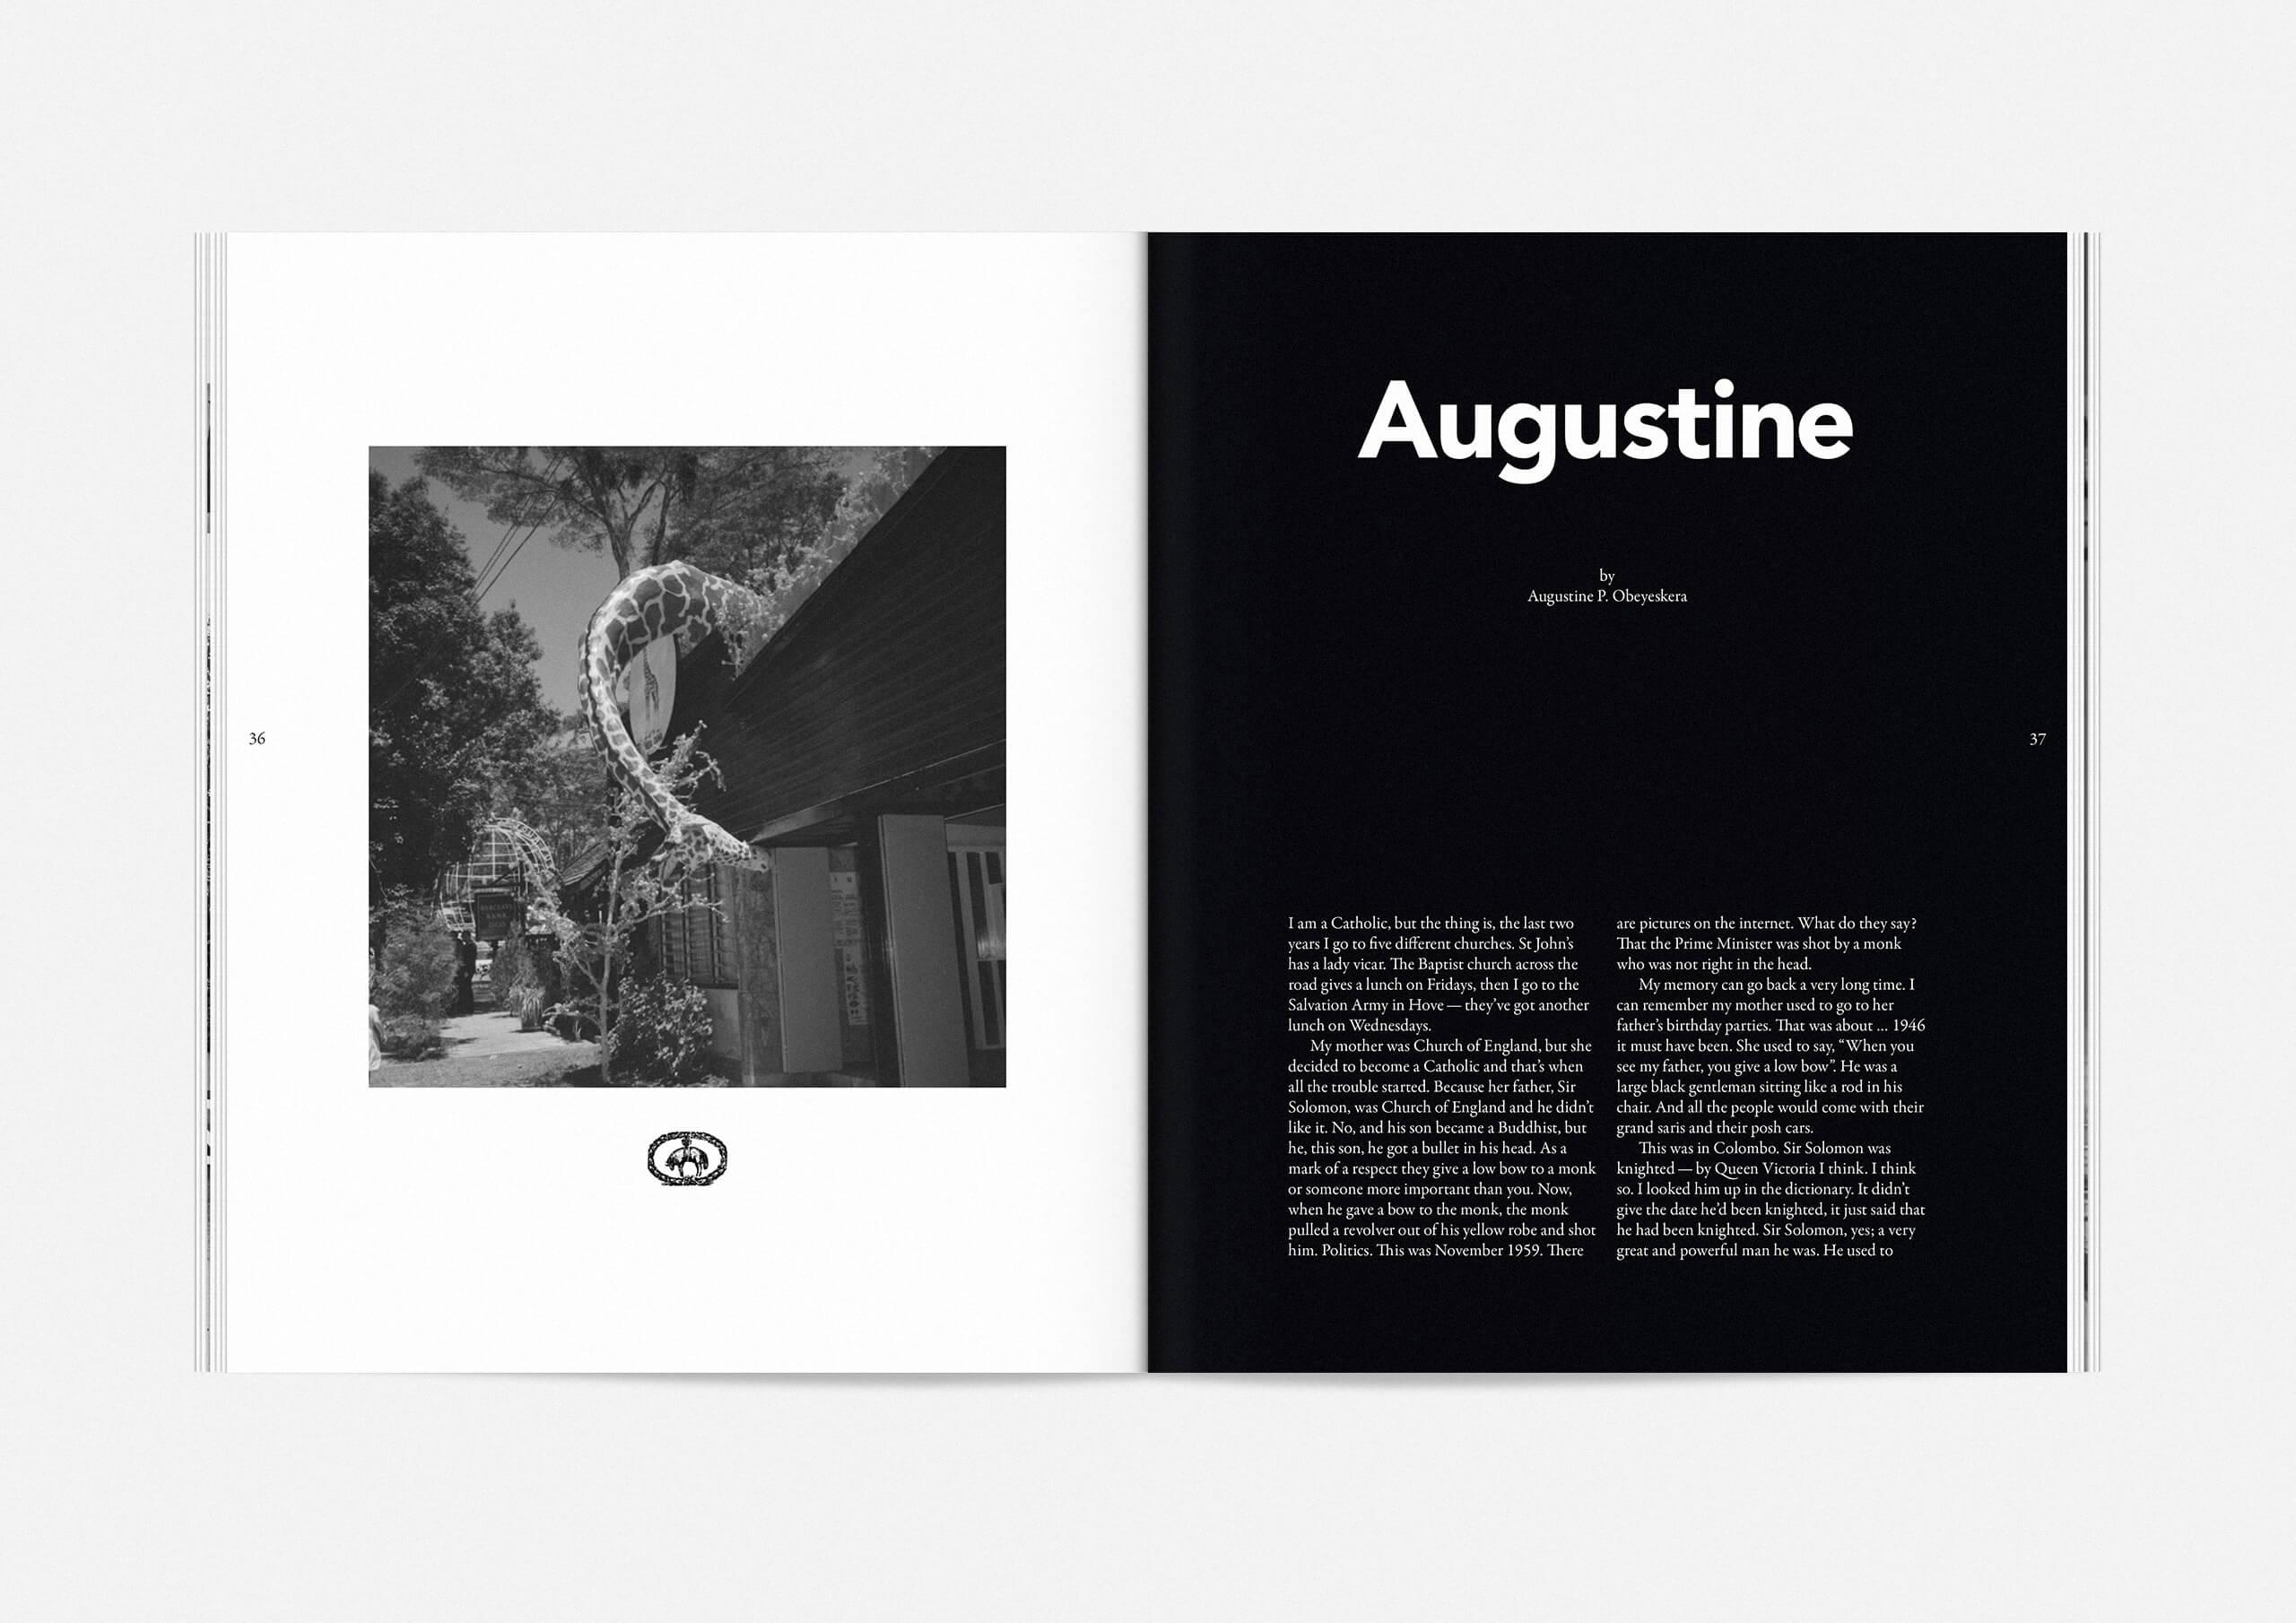 https://neuegestaltung.de/media/pages/clients/teller-magazine-issue-1/0462508d5b-1597415429/teller_issue_01_innenseite_36_37_ng.jpg